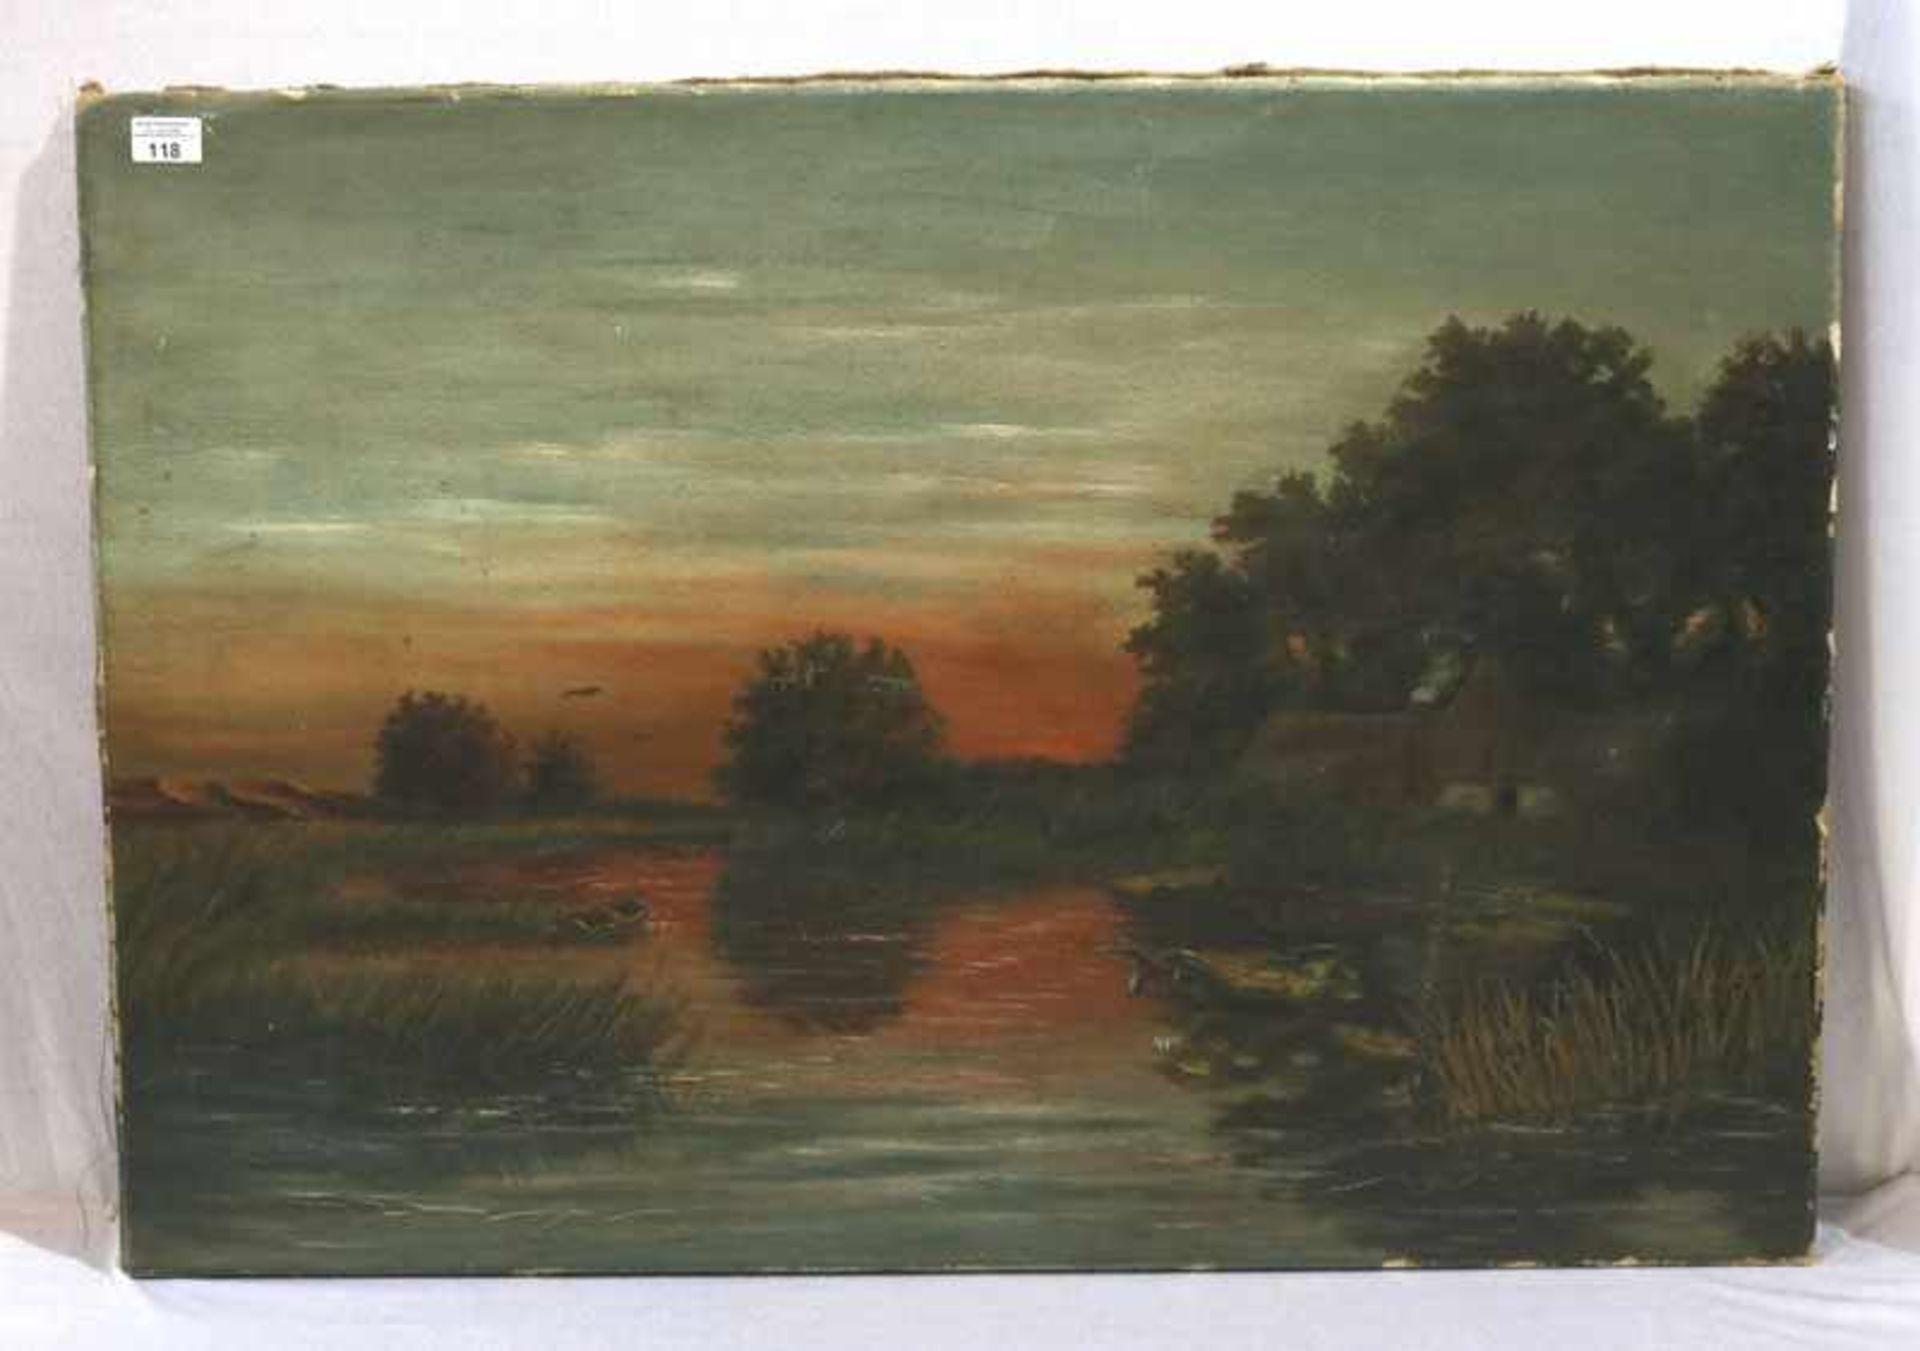 Los 118 - Gemälde ÖL/LW 'Reetdachhaus am Flußlauf bei Sonnenuntergang', rückseitig bez. F. Steger, LW teils